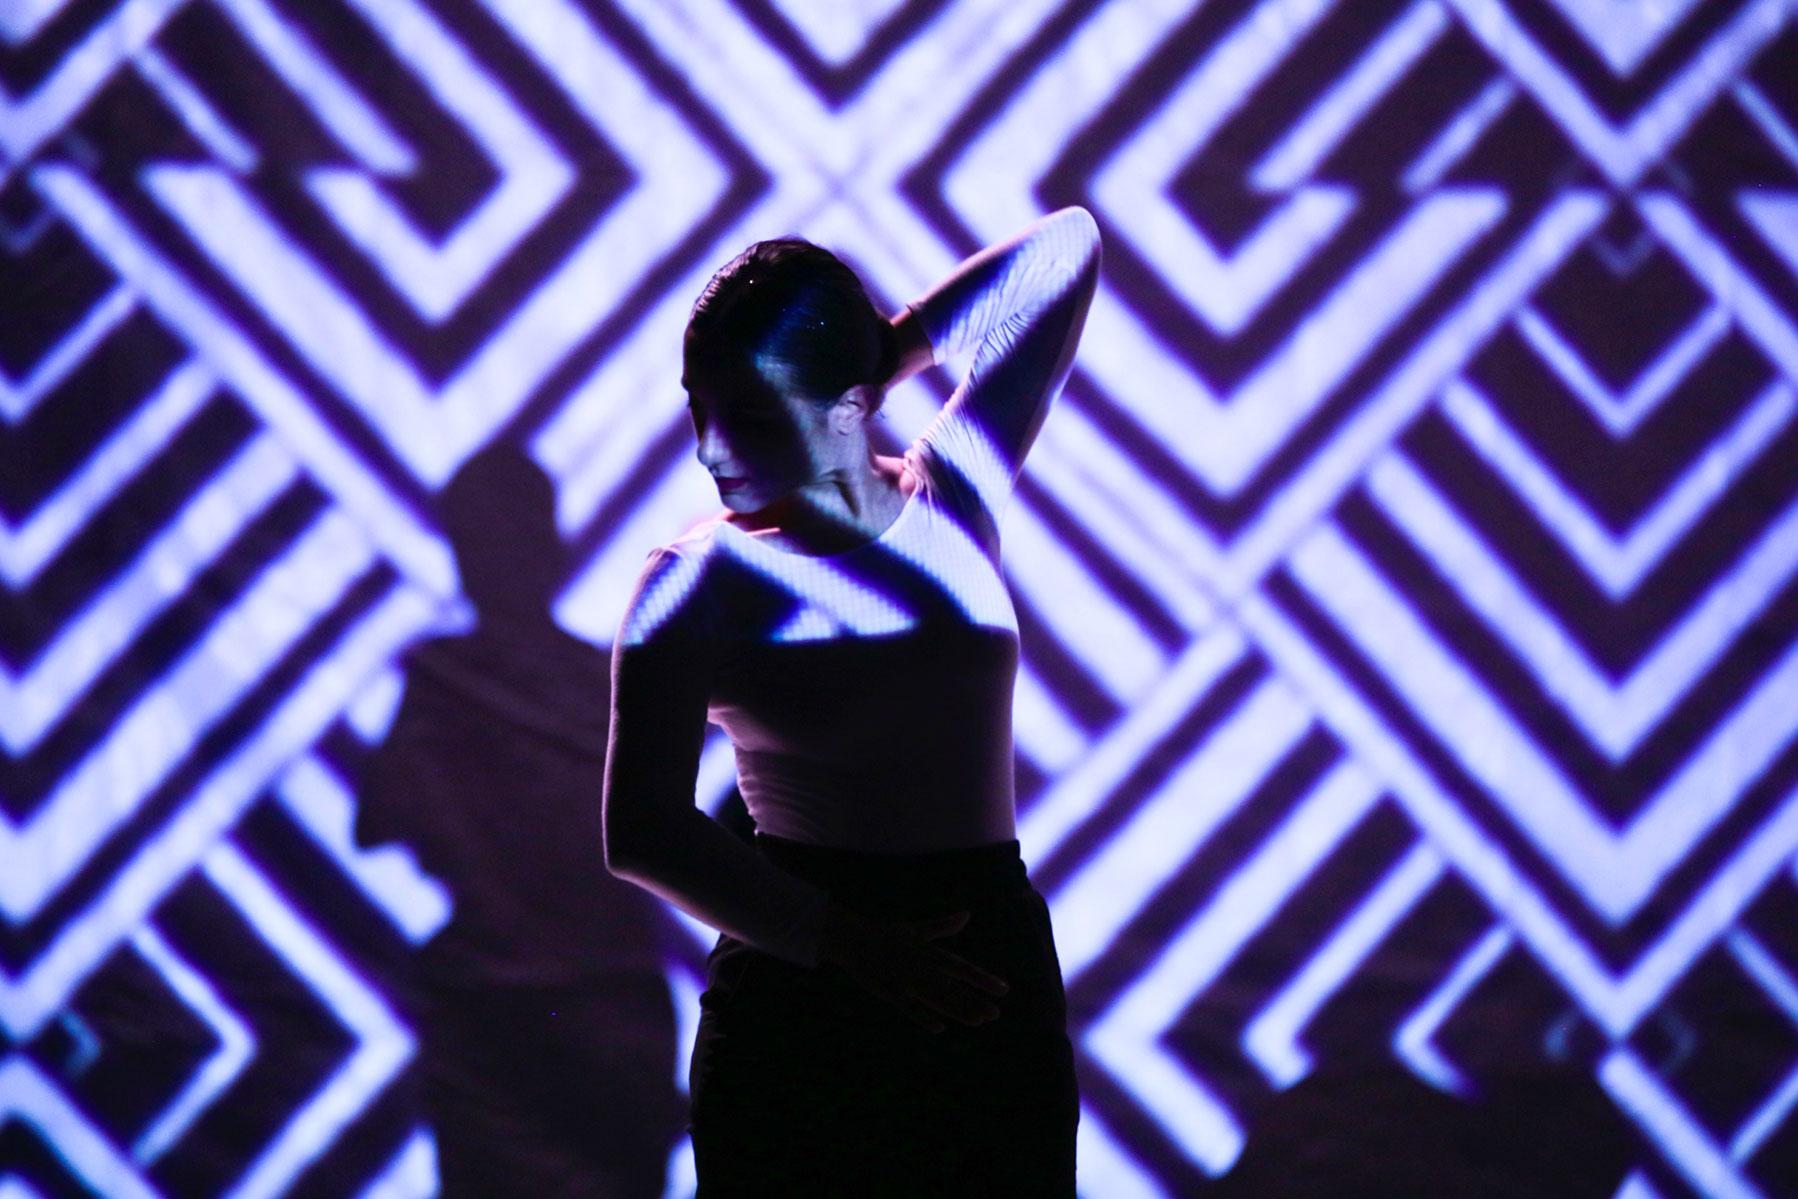 Foto Oniris Dance Lab - Florence Dance Festival - L'Enigma Senza Fine 3